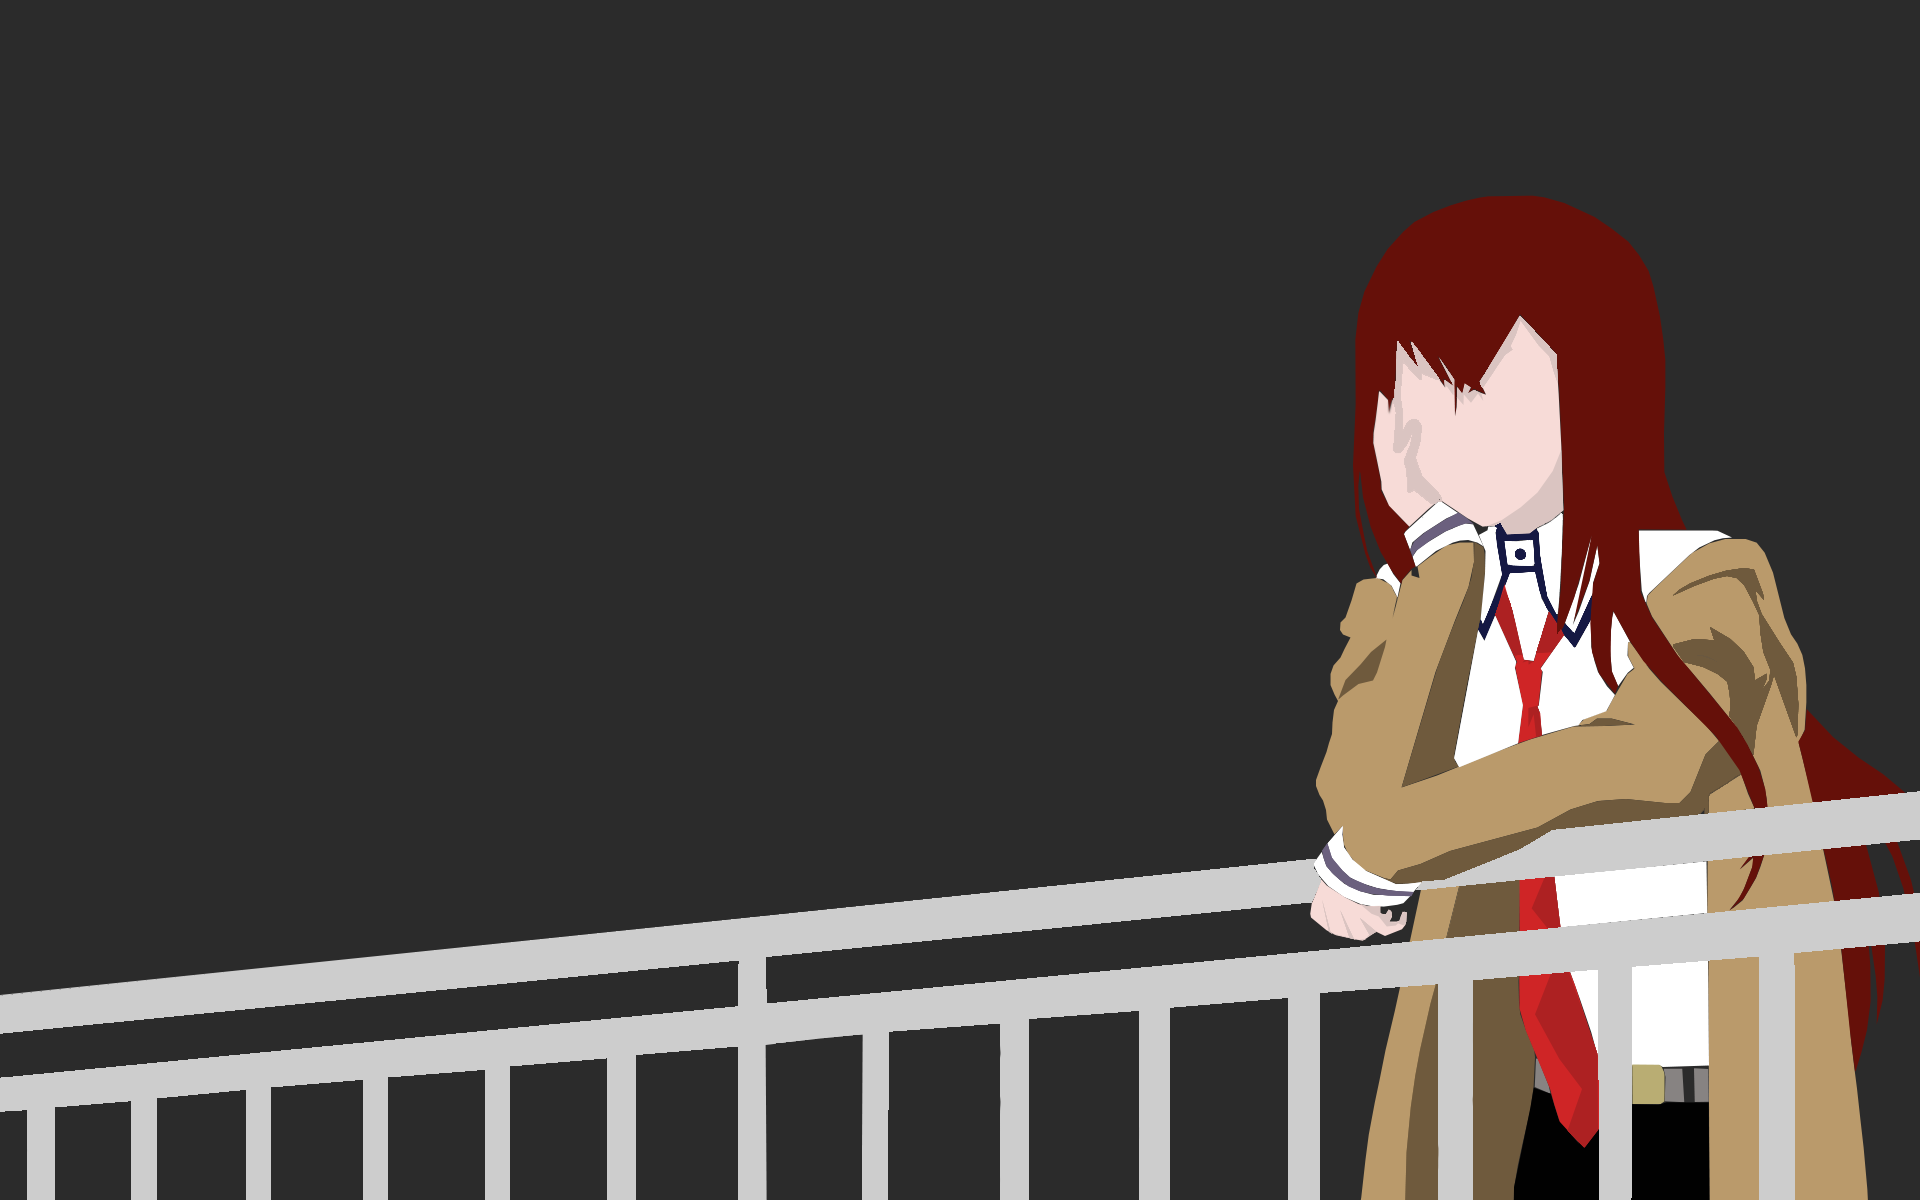 makise kurisu steins;gate anime girls vector